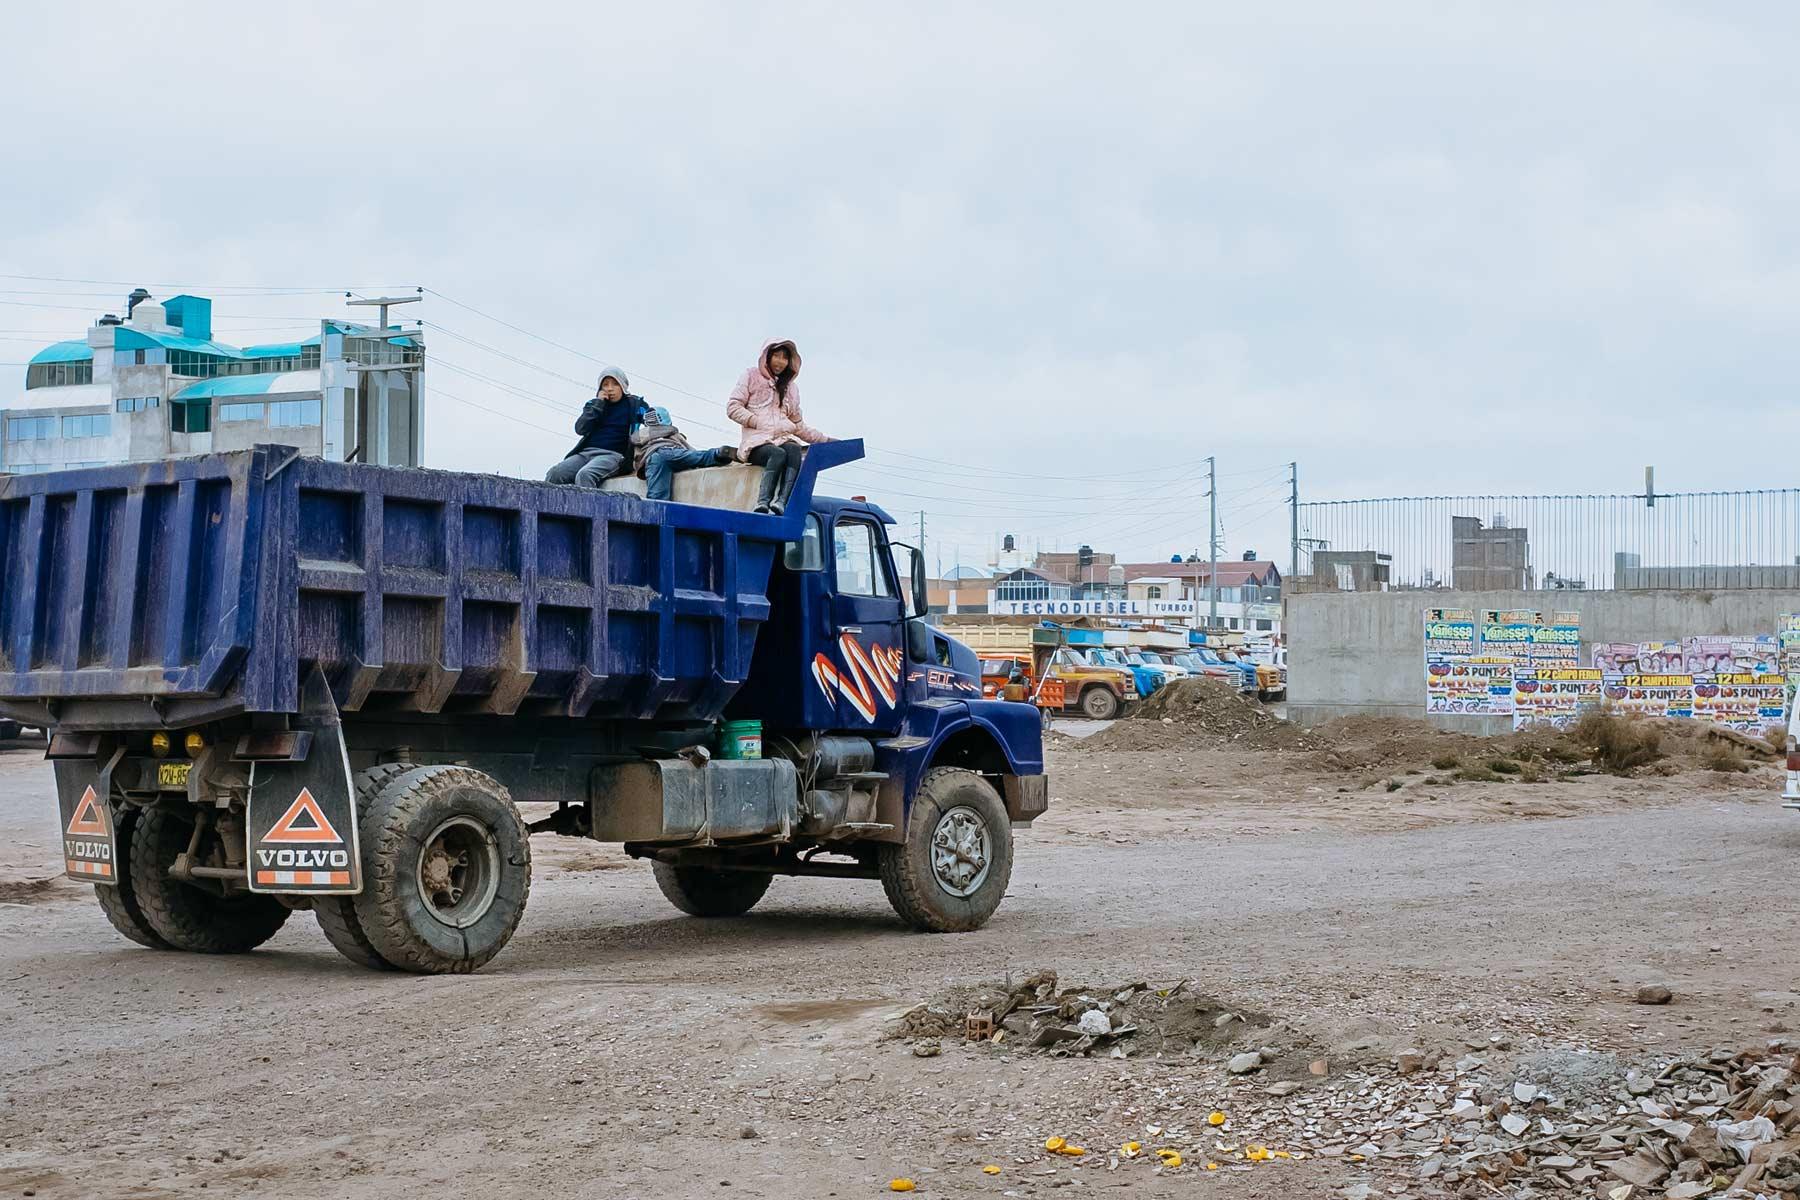 Three children riding on the back of a mining dump truck in Juliaca.